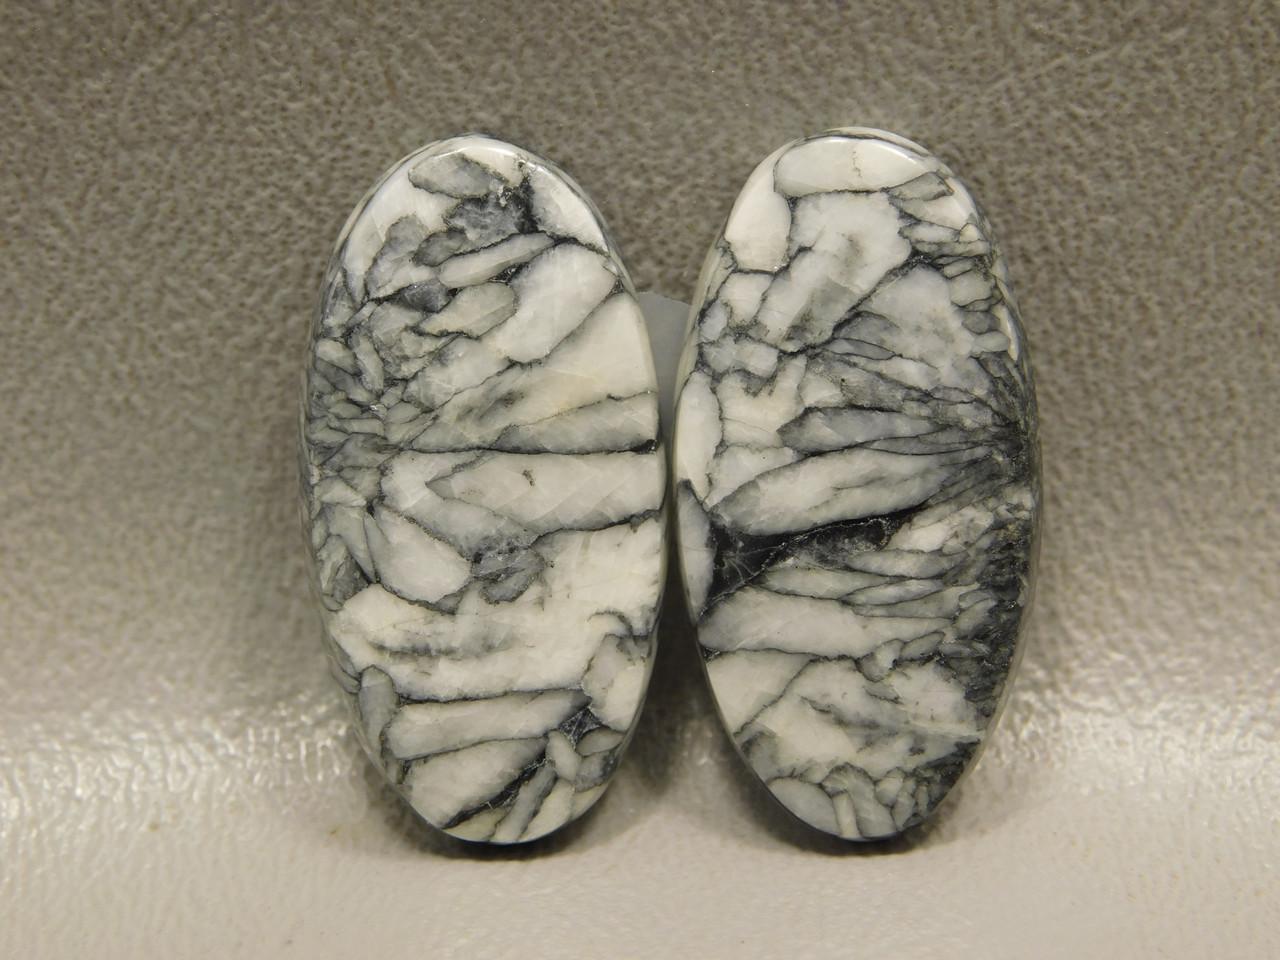 Pinolith or Pinolite Matched Pair Jewelry Making Stone Cabochons #12